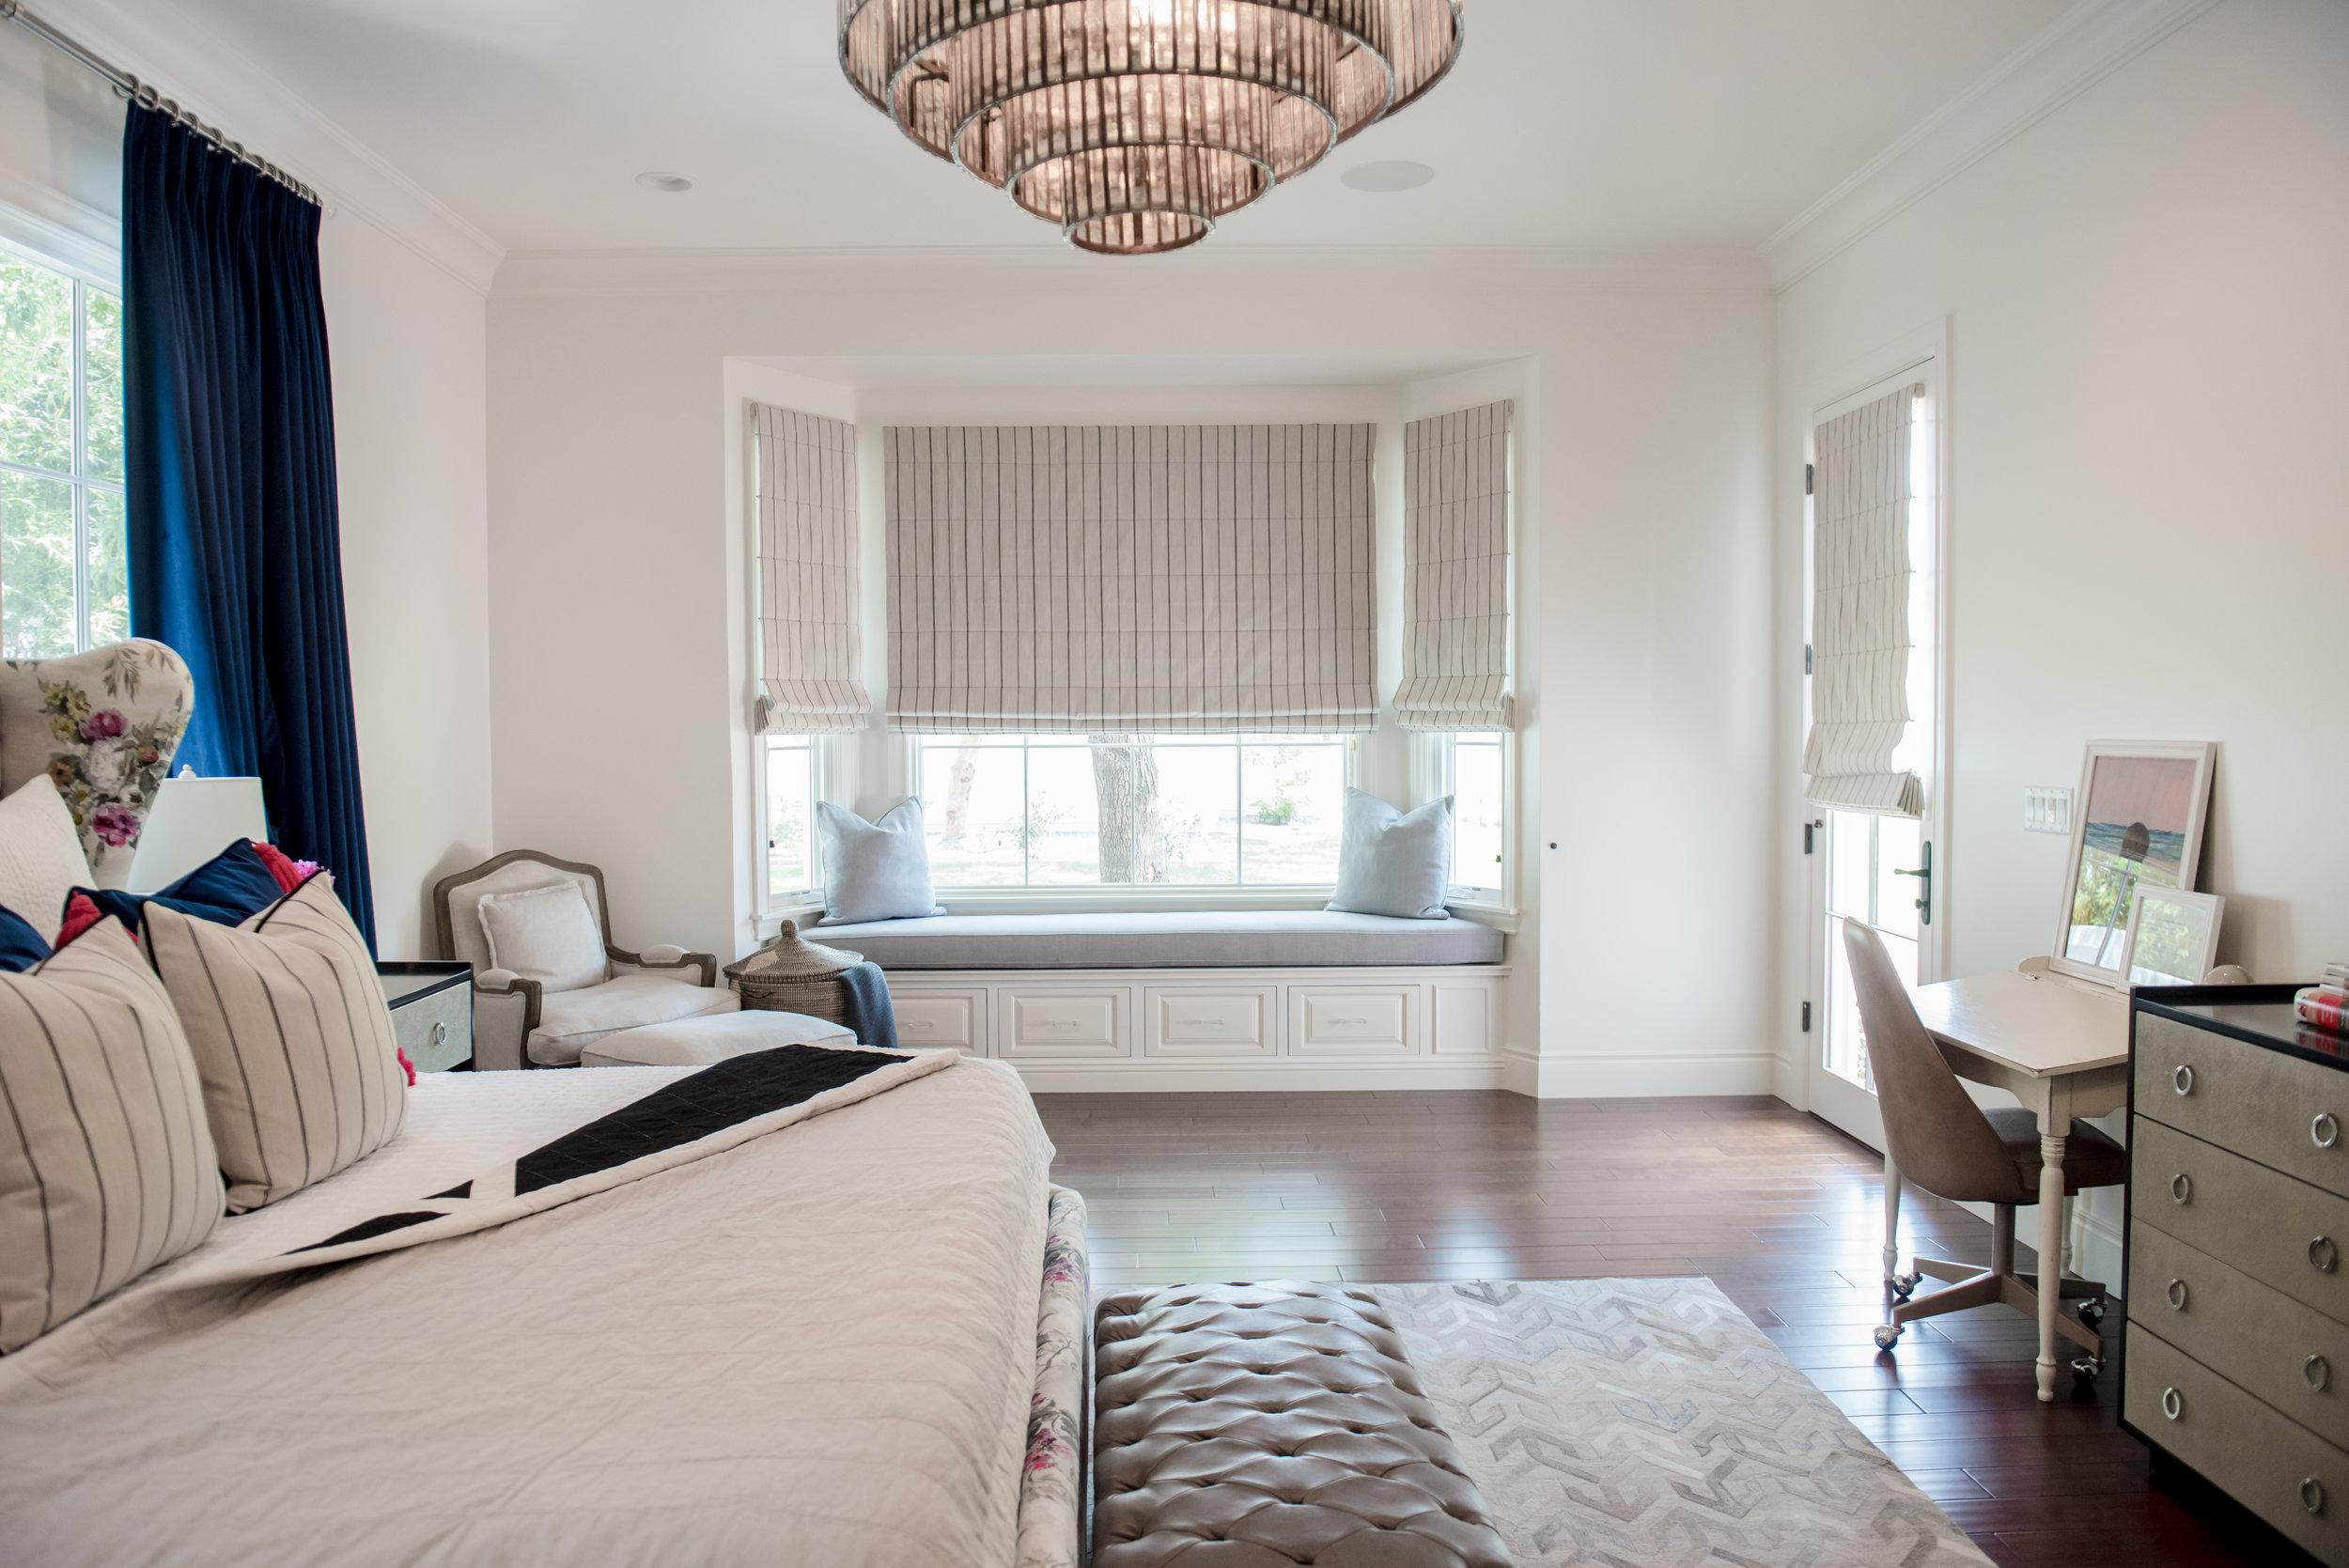 66+Master+Bedroom+Traditional+Floral+Custom+Artwork+Scottsdale+Drapery+Restorationhardware+Crystal.jpg